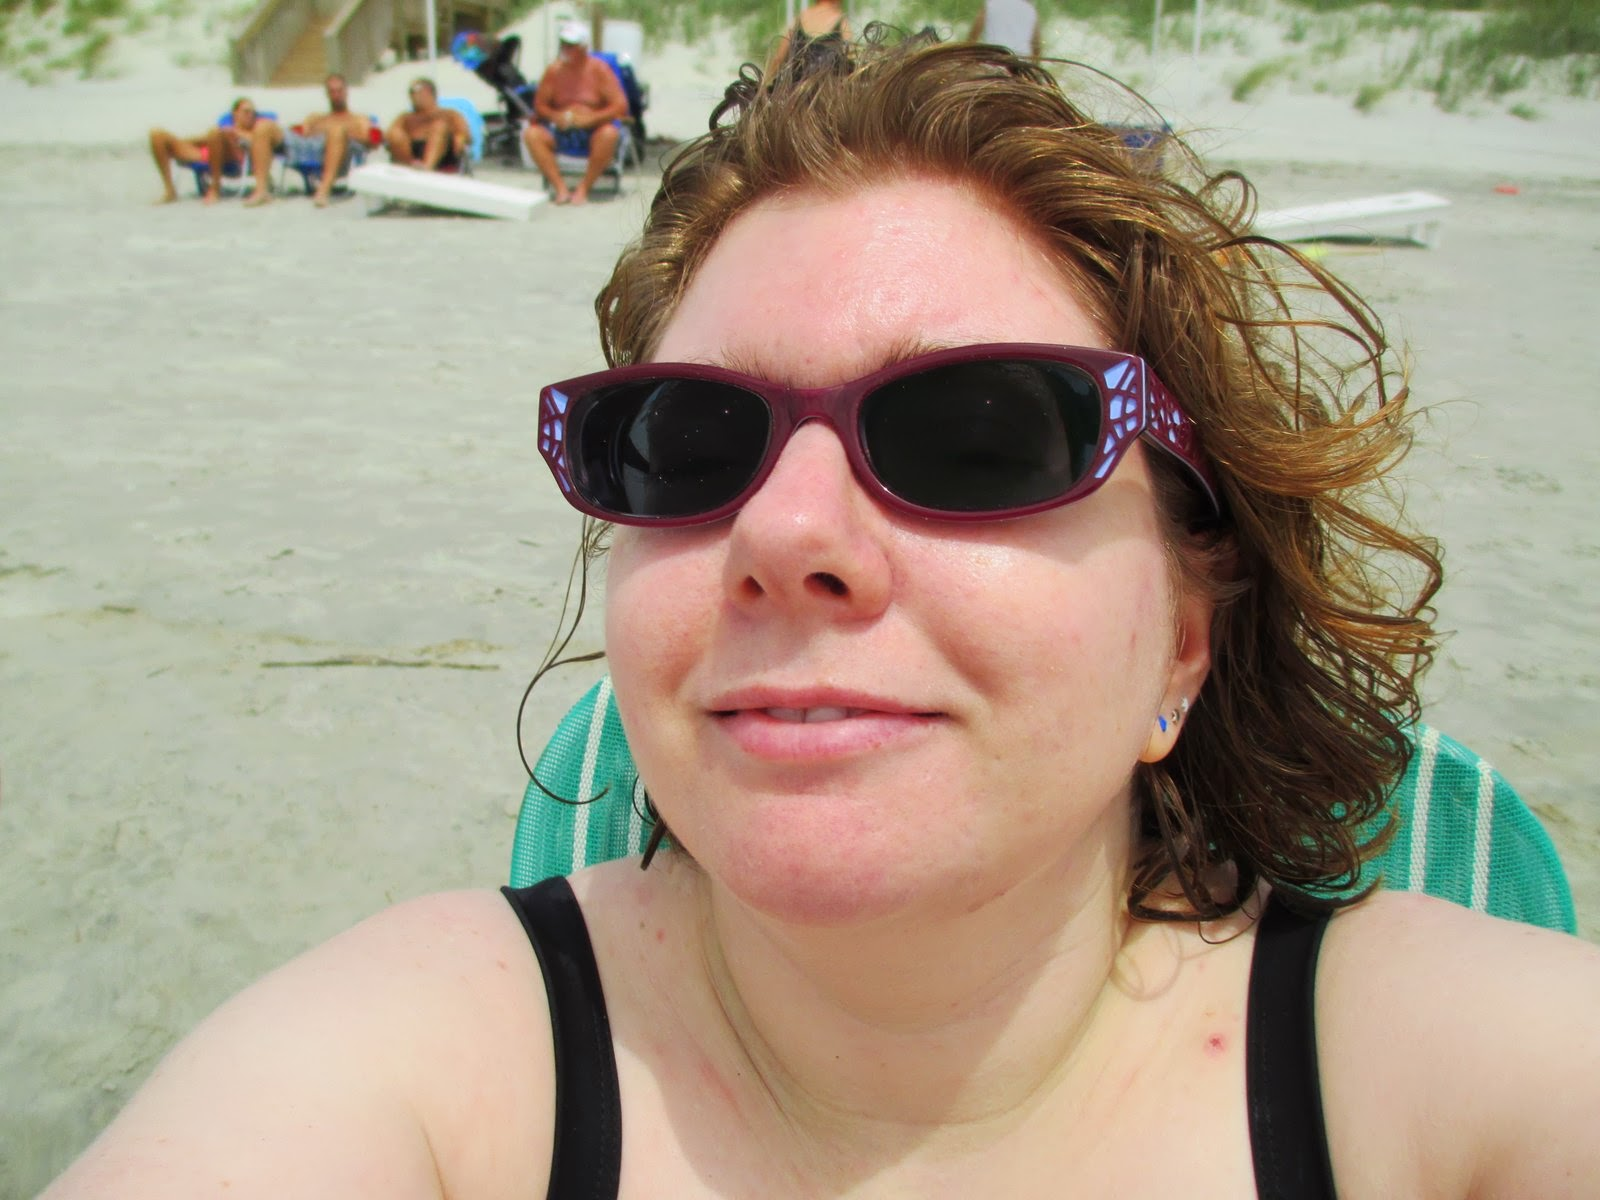 Ugly Girl Selfie | www.imgkid.com - The Image Kid Has It!